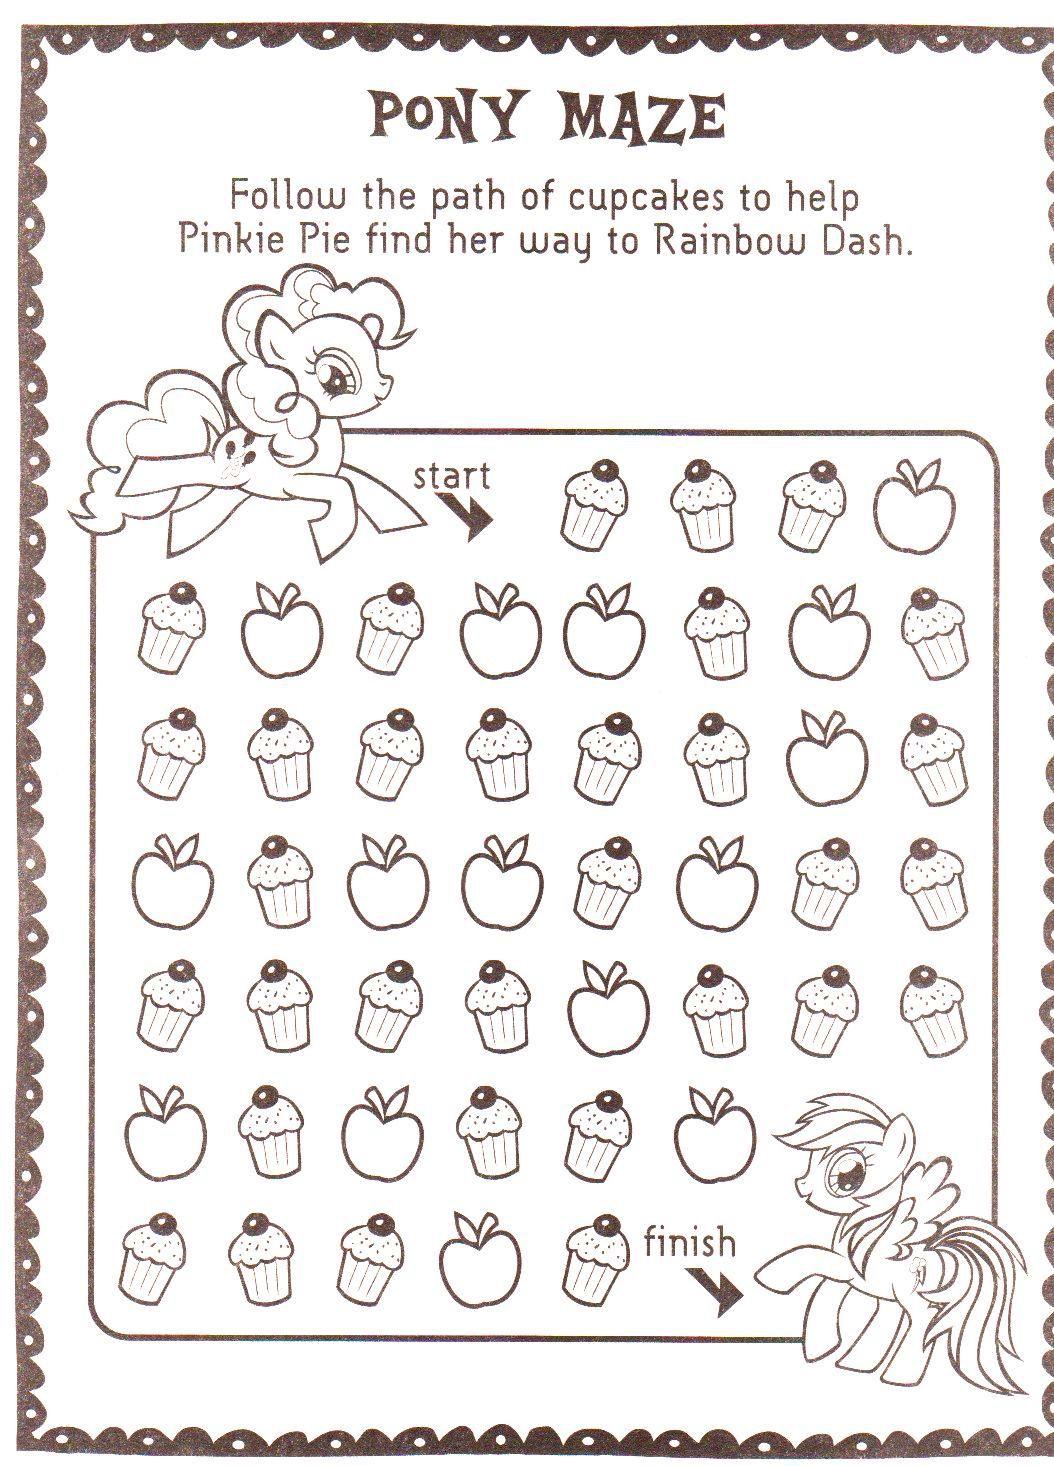 Pinkie Pie And Rainbow Dash Cupcake Maze